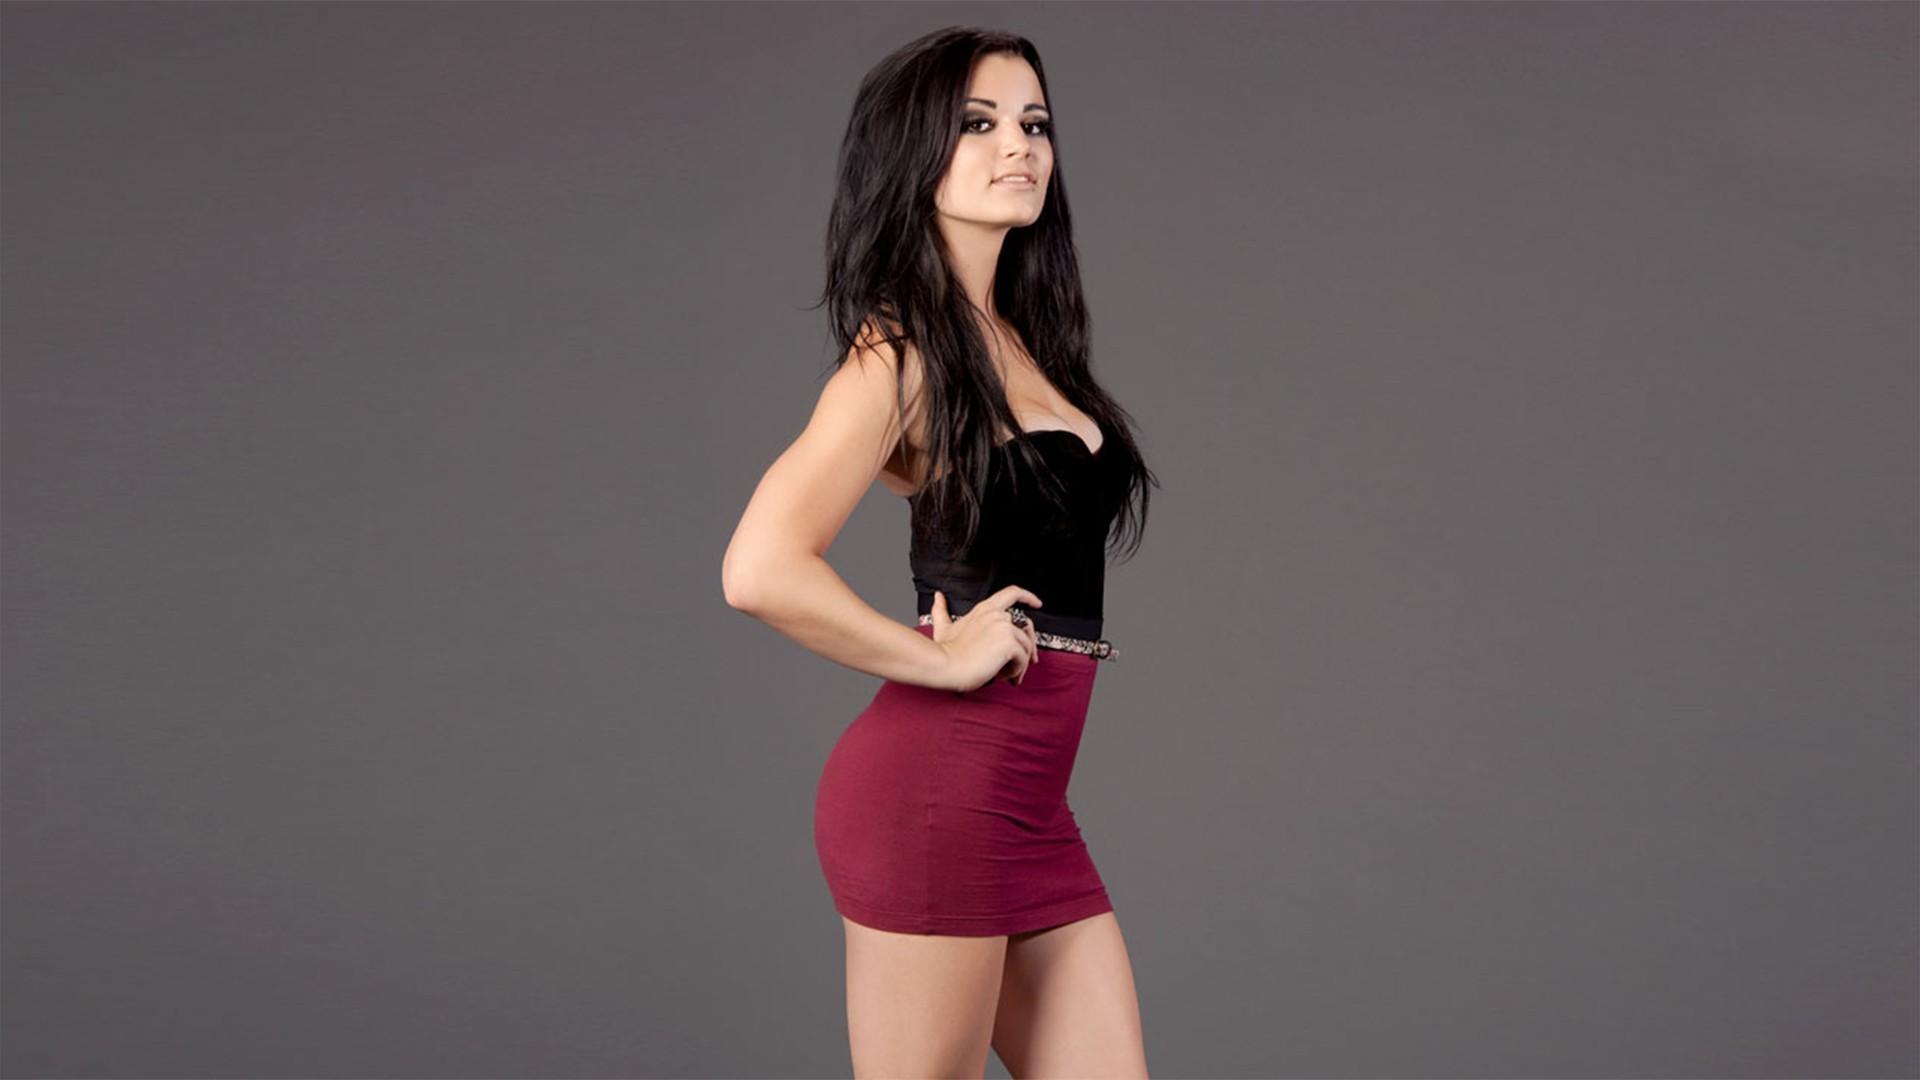 Gia Paige Full Hd